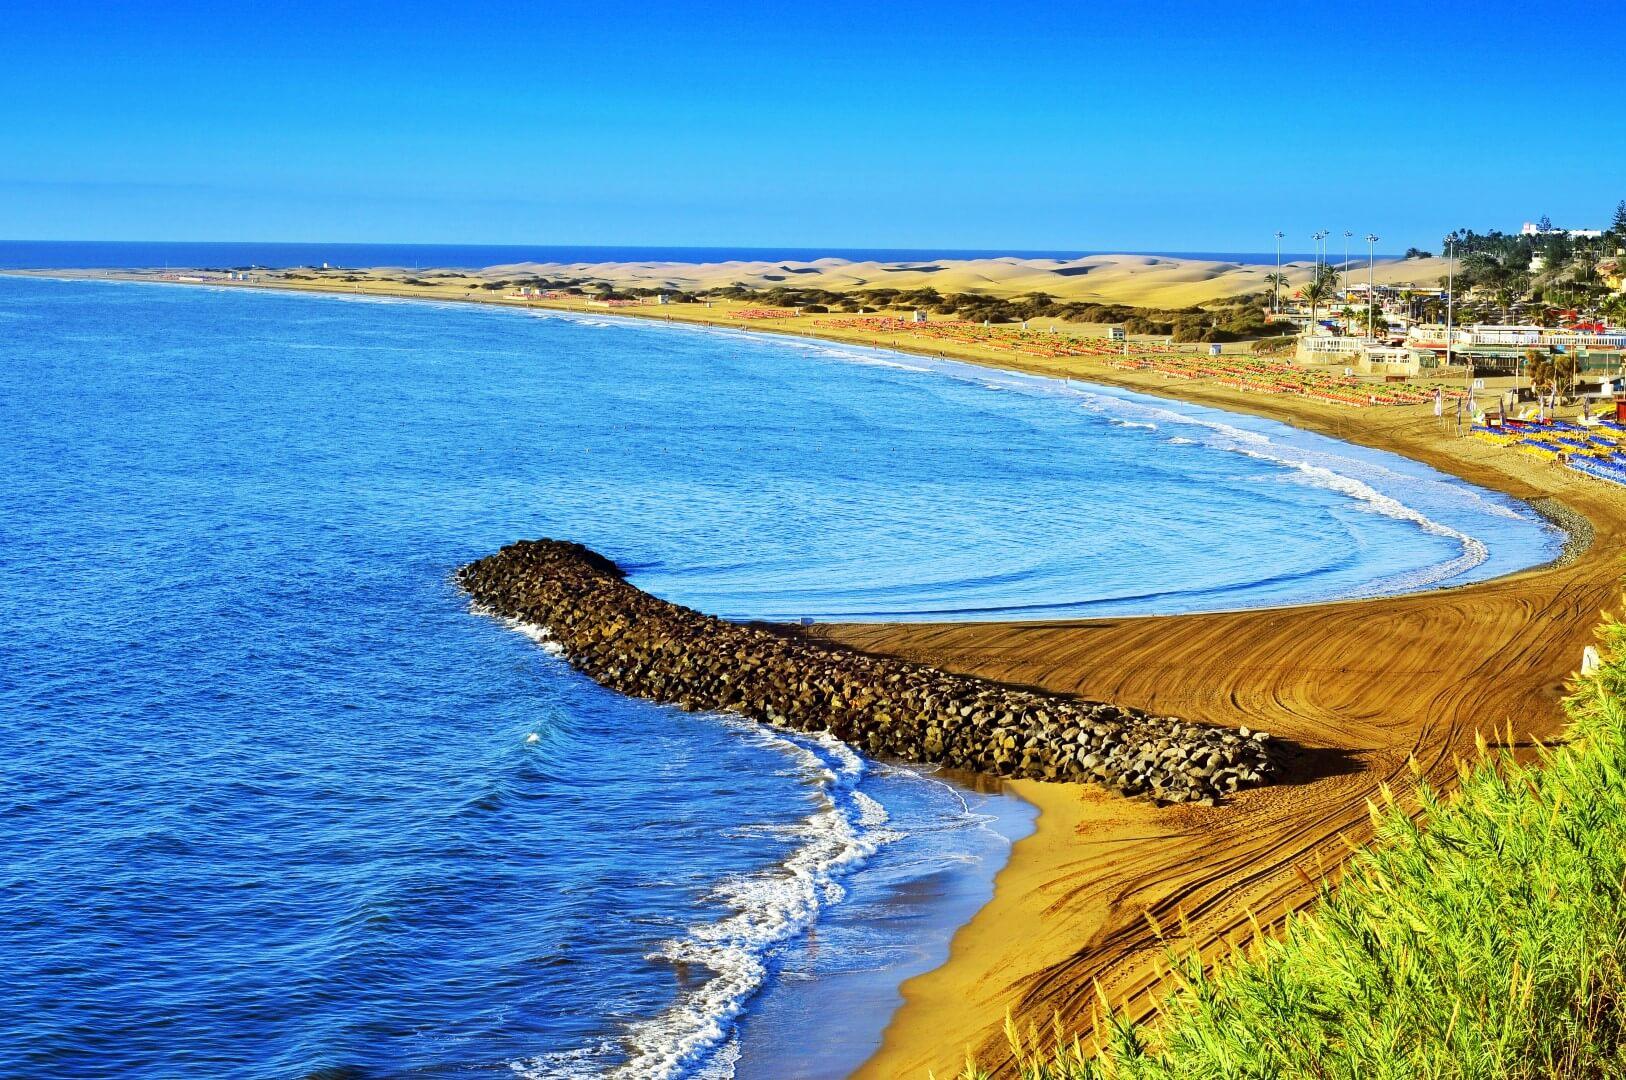 destinos-playa-moda-semana-santa-playa-del-ingles-2